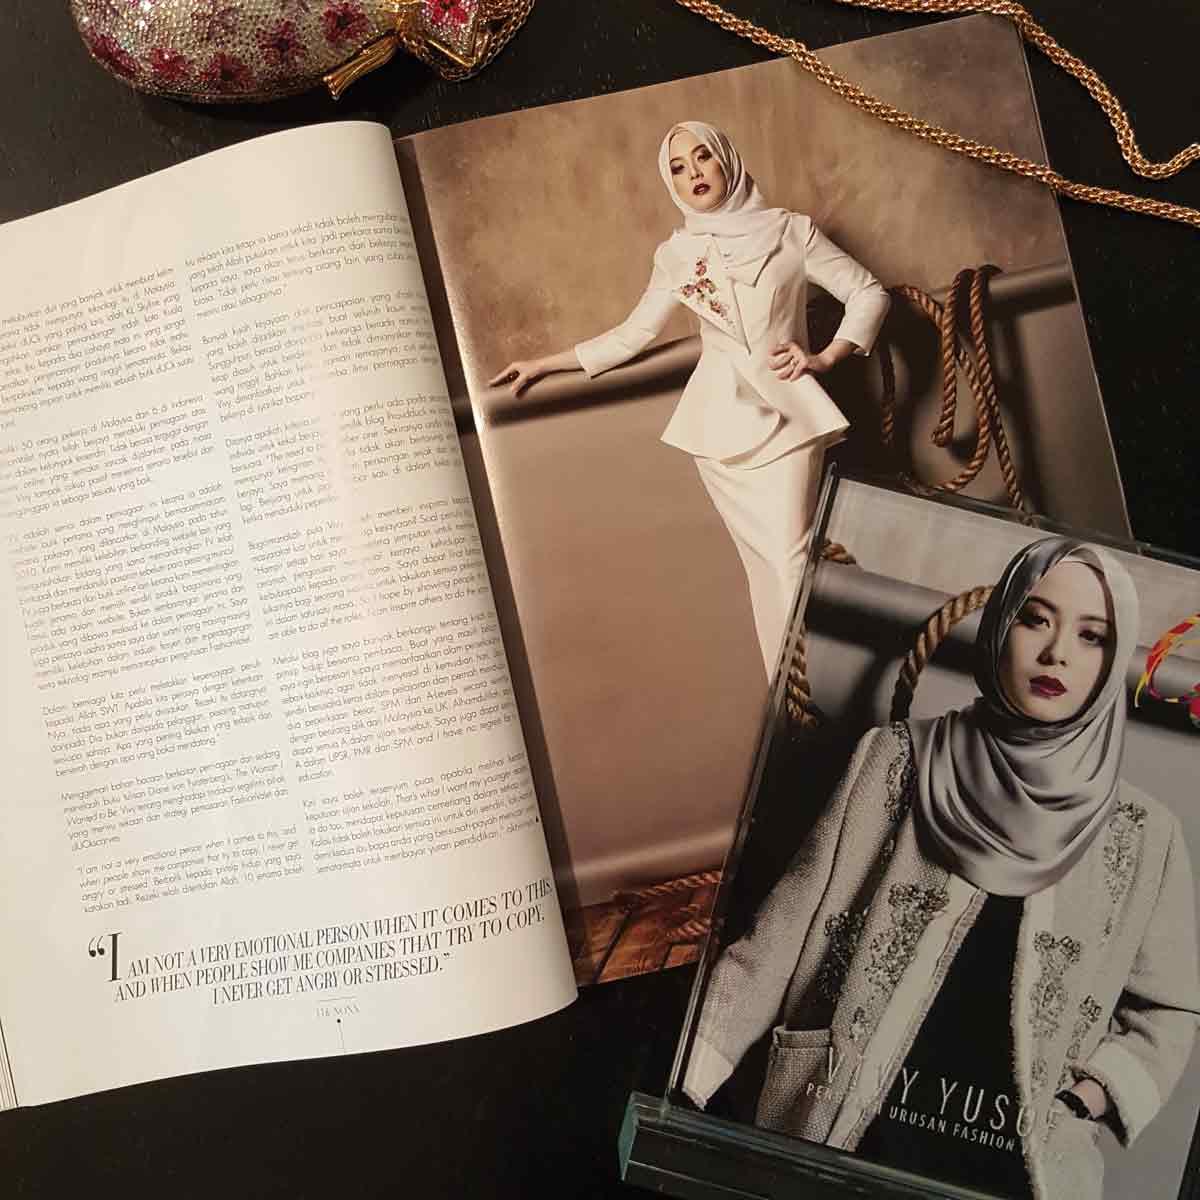 Vivy Yusof, FashionValet, dUCK Scarves, Fashion, Entrepreneurship, Interview